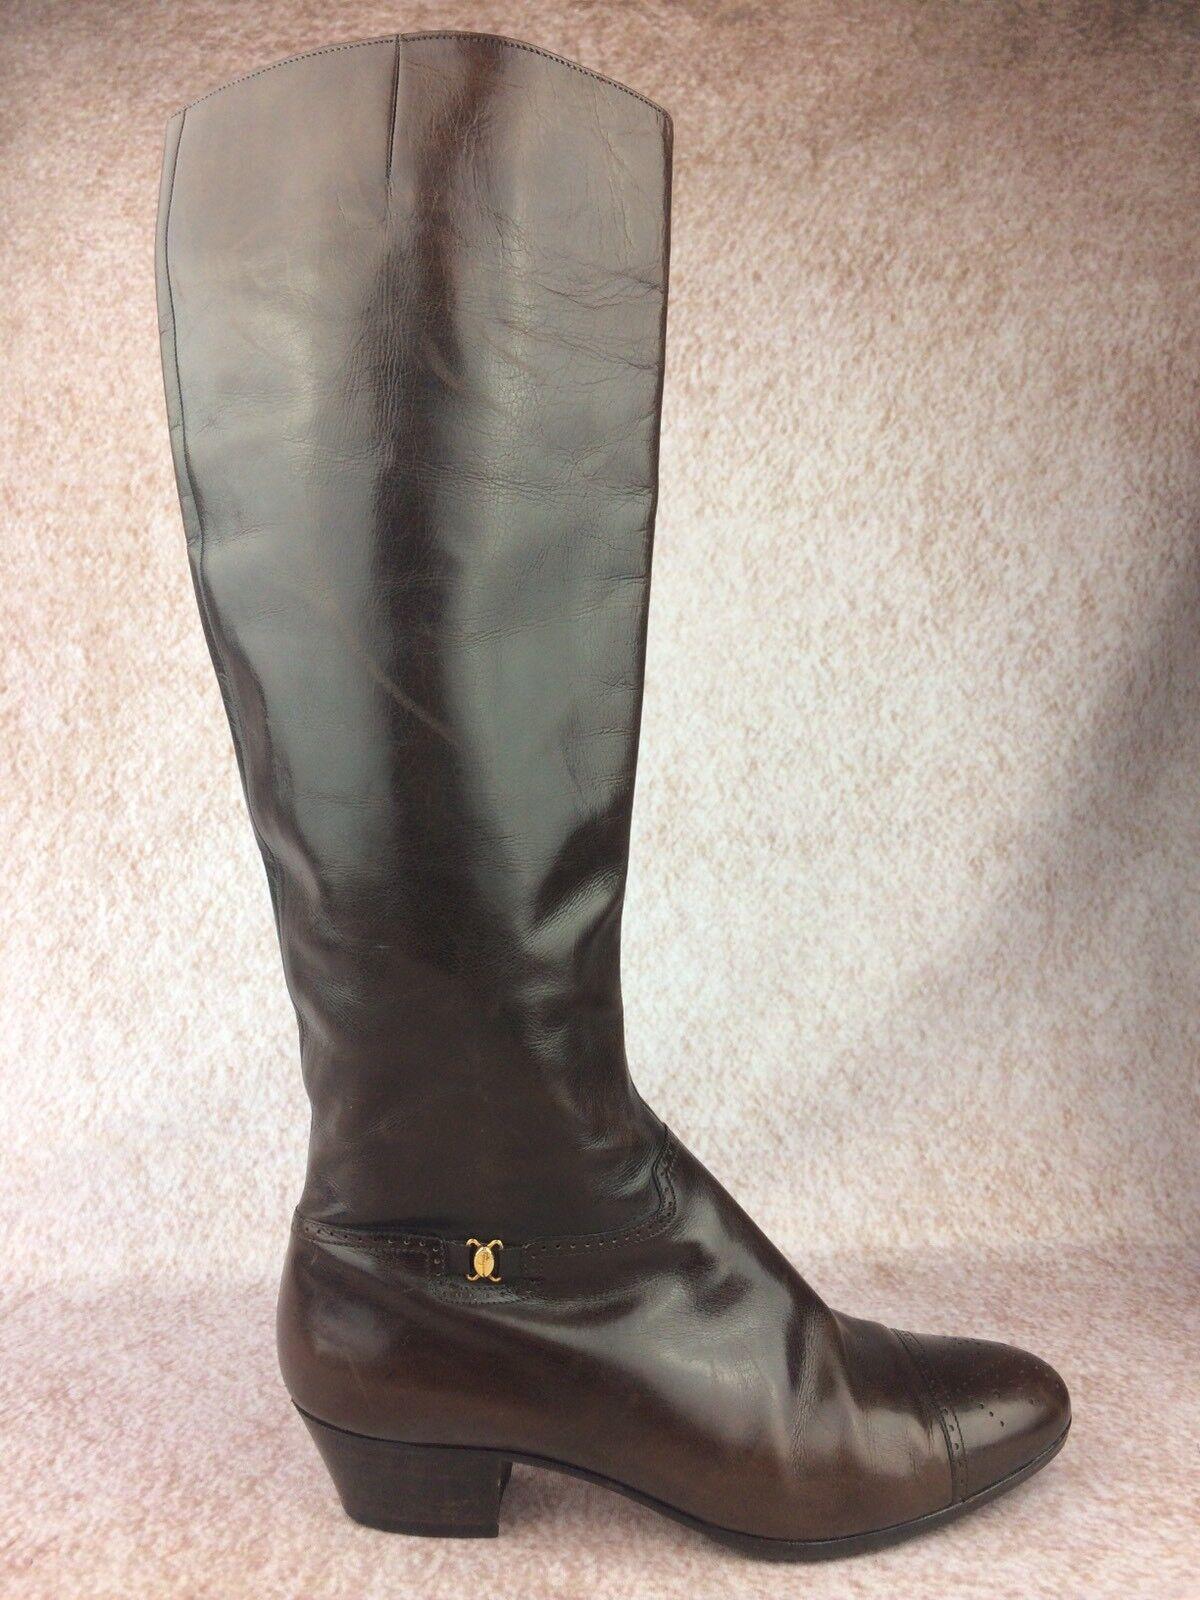 Salvatore Ferragamo Vintage Size 5.5  Brown Leather Zip High Riding Boots